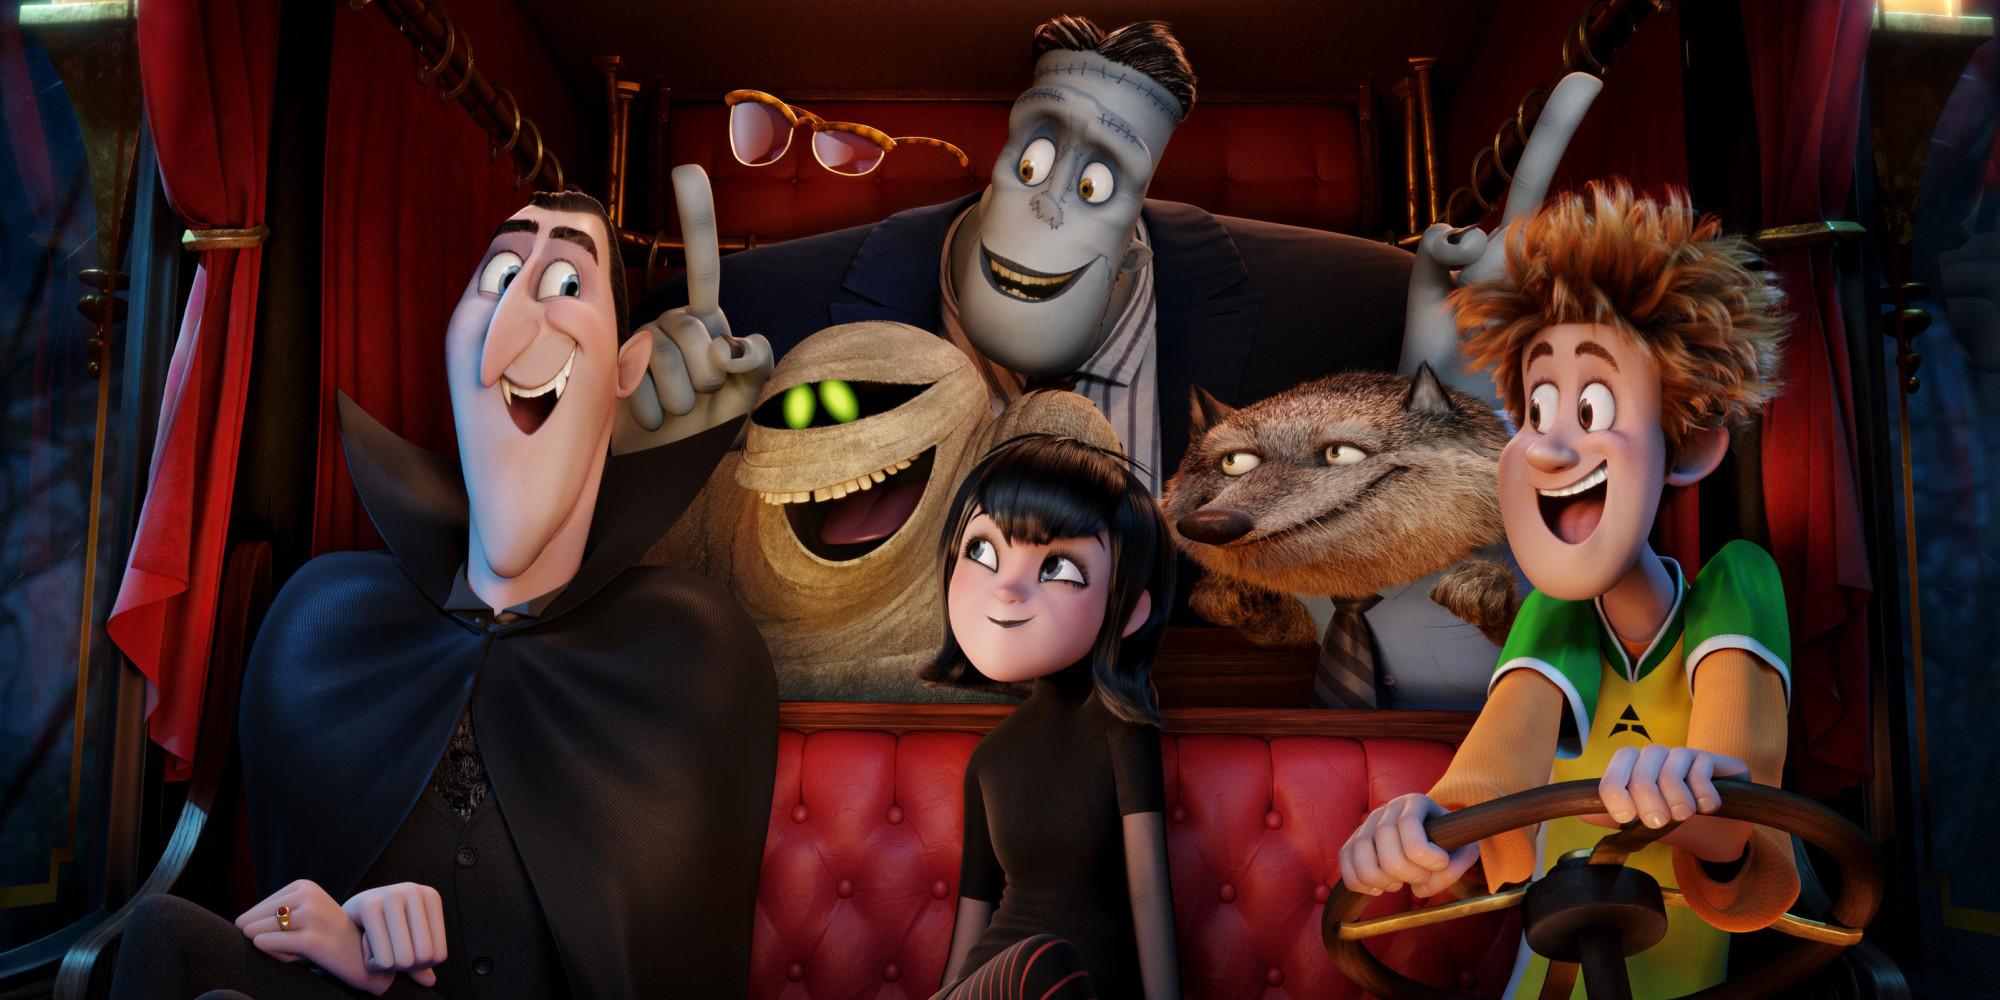 Hotel Transylvania 4 Trailer Released: Cast & Release Date